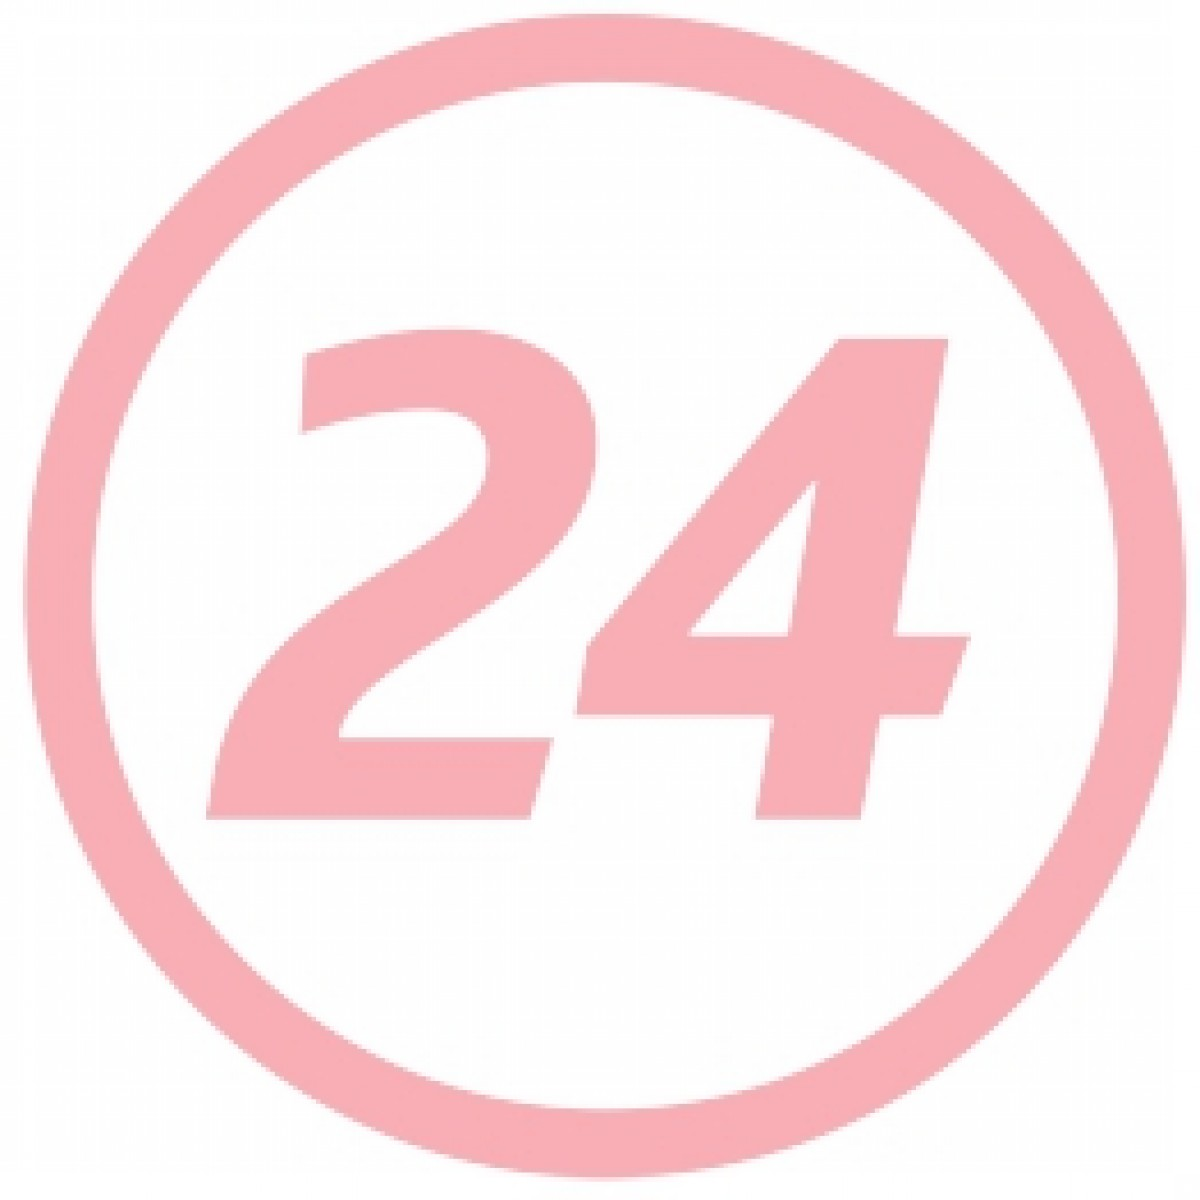 Dermaplast Universal 5 Marimi Rezistent la Apa, Plasture, 40buc